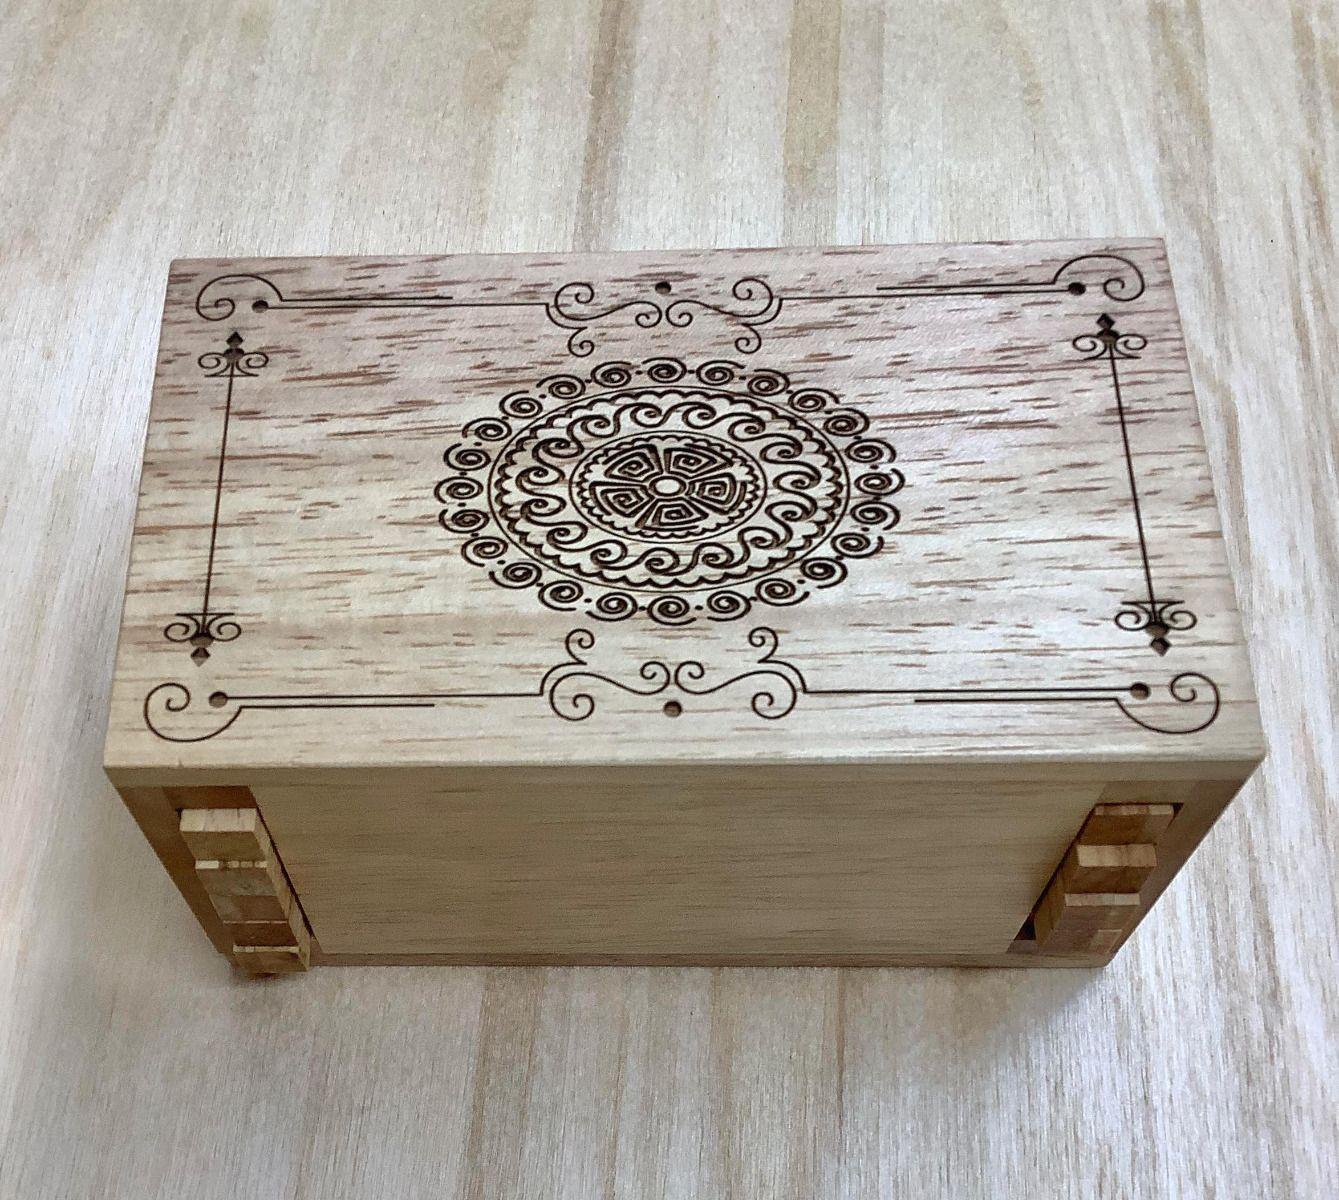 Secret Lock Box w/ Mandala Design